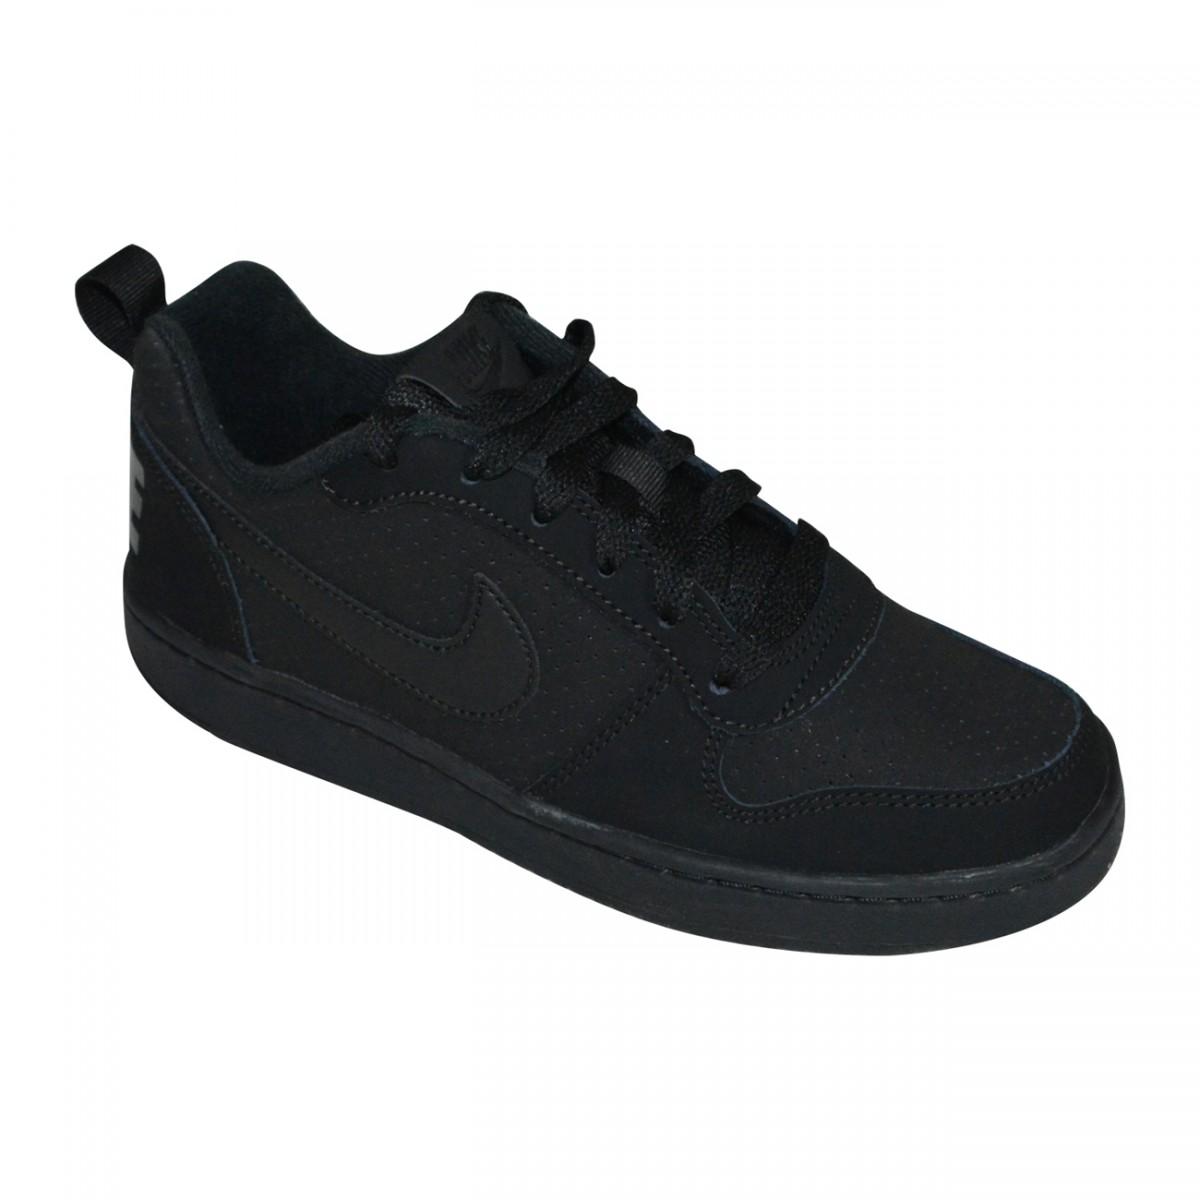 0e31f9d9cf4 Tenis Nike Court Borough Low Juvenil 839985 001 - Preto Preto - Chuteira  Nike